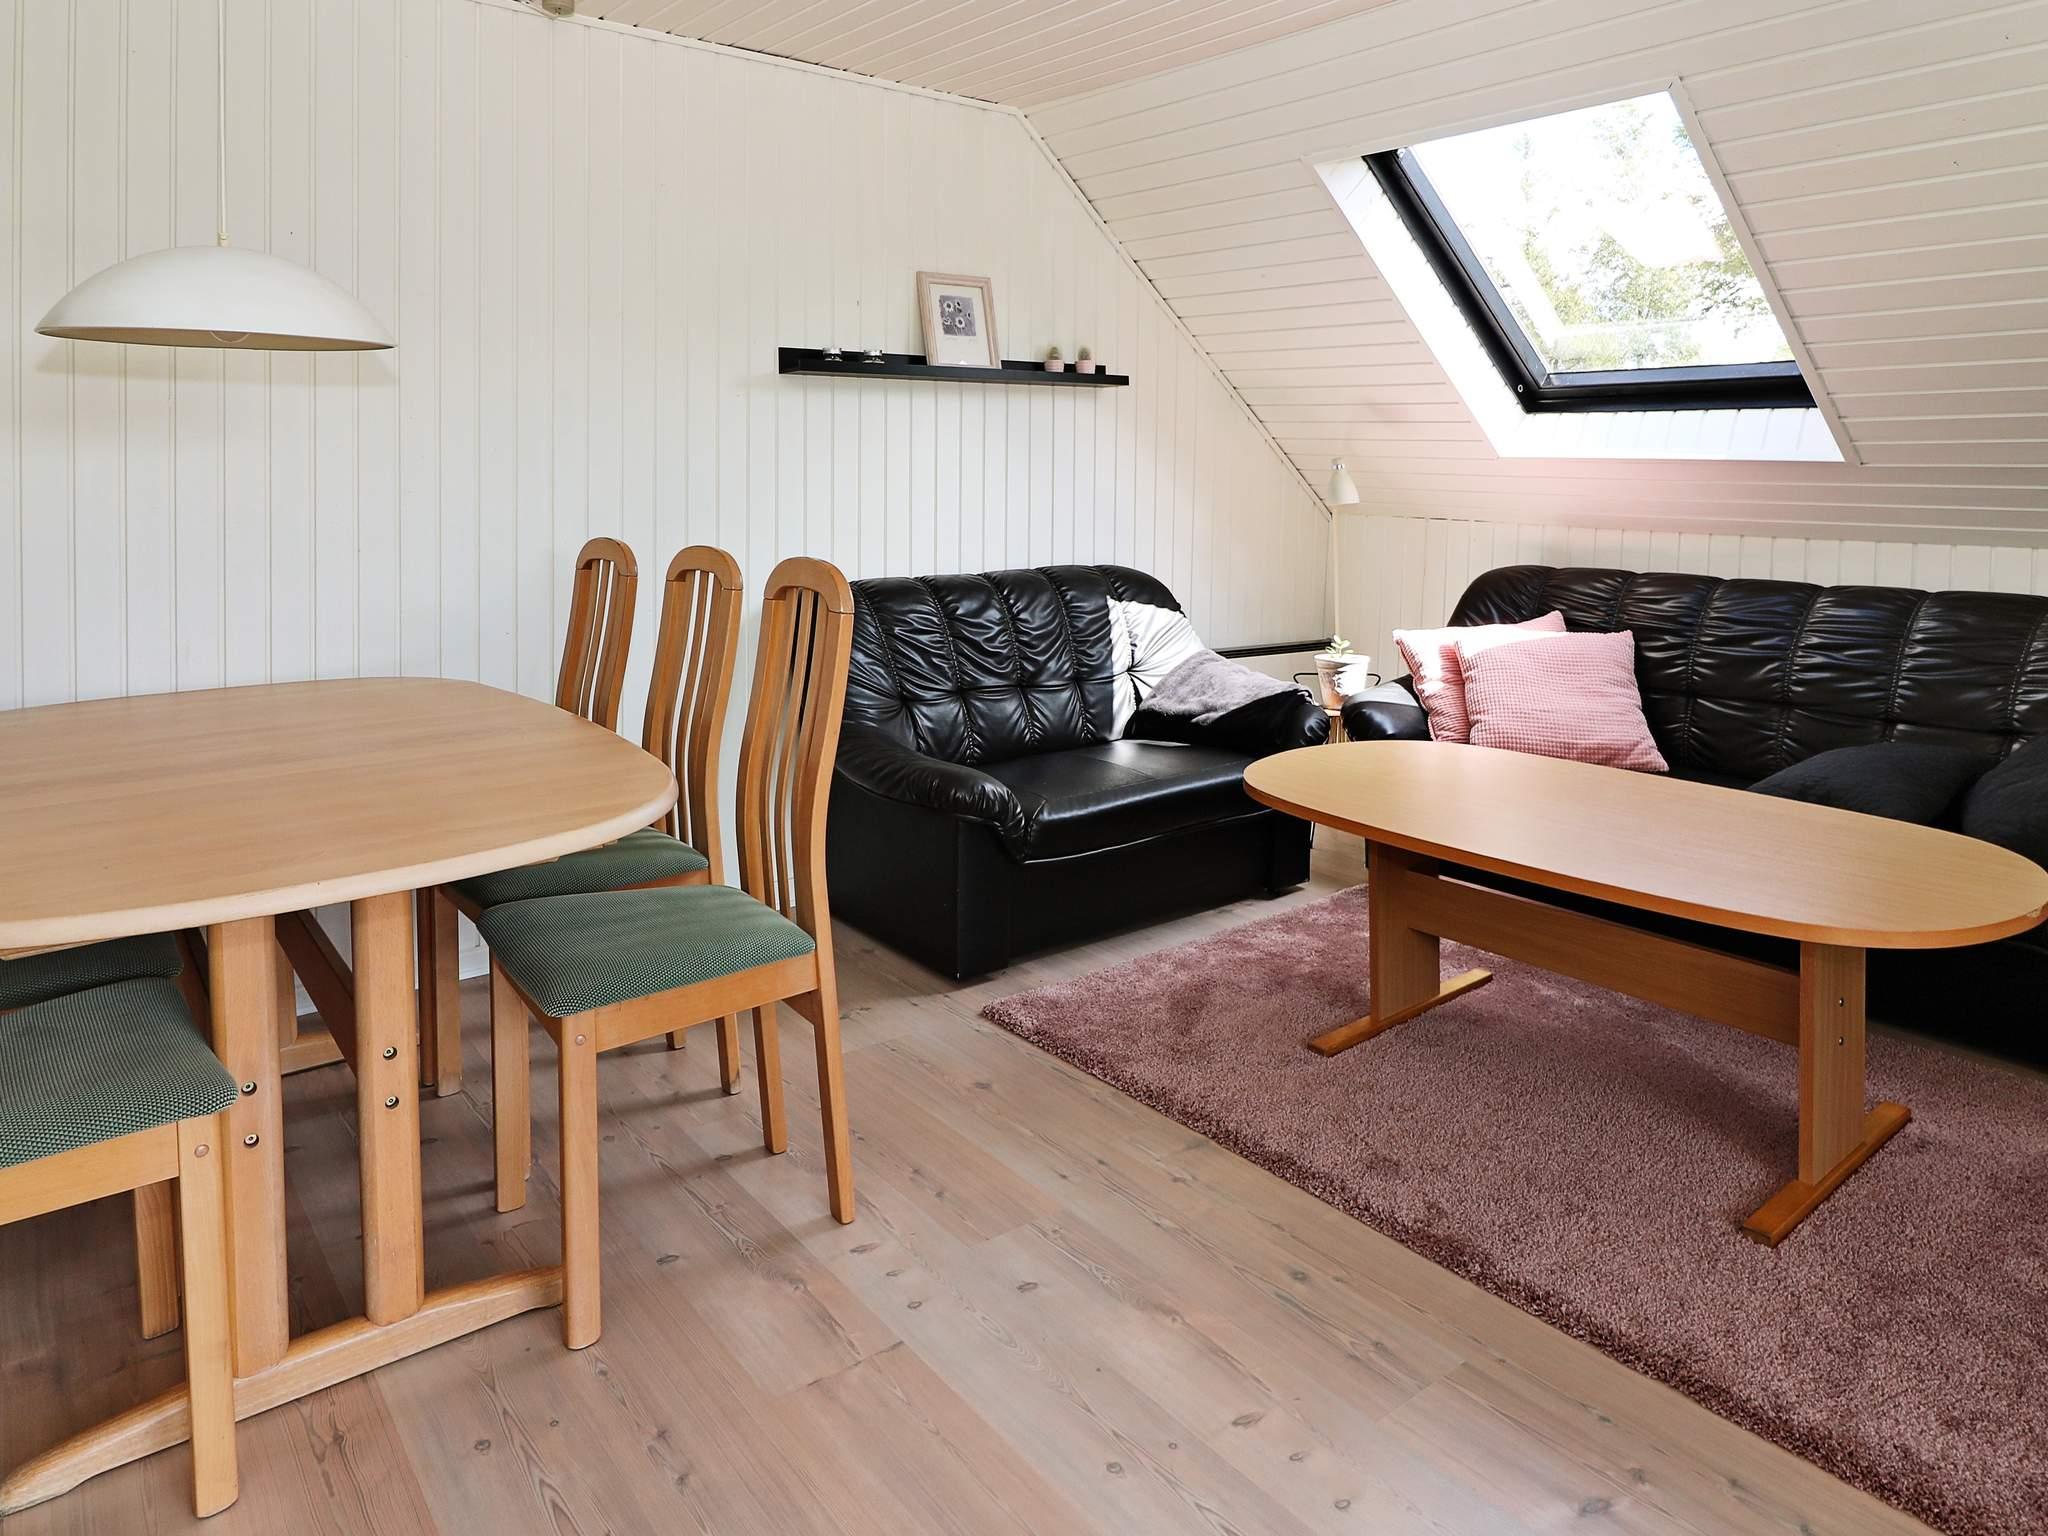 Ferienhaus Øster Hurup (437885), Øster Hurup, , Ostjütland, Dänemark, Bild 5